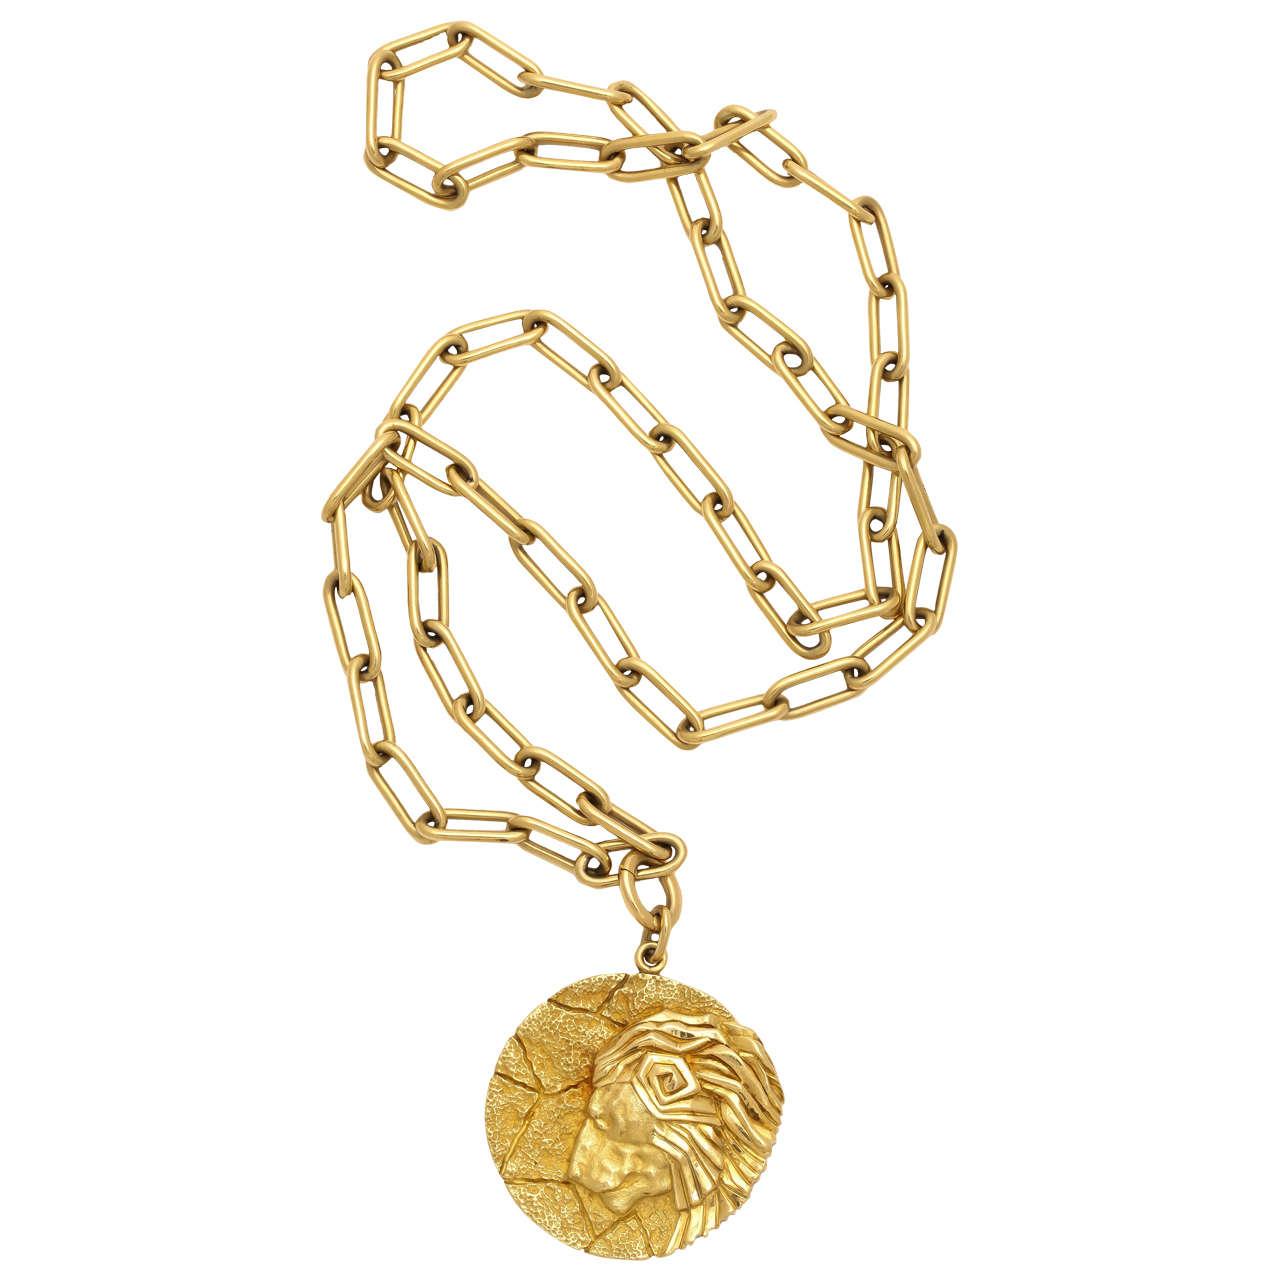 Tiffany and co gold zodiac leo pendant and chain necklace at 1stdibs tiffany co gold zodiac leo pendant and chain necklace 1 audiocablefo light Images